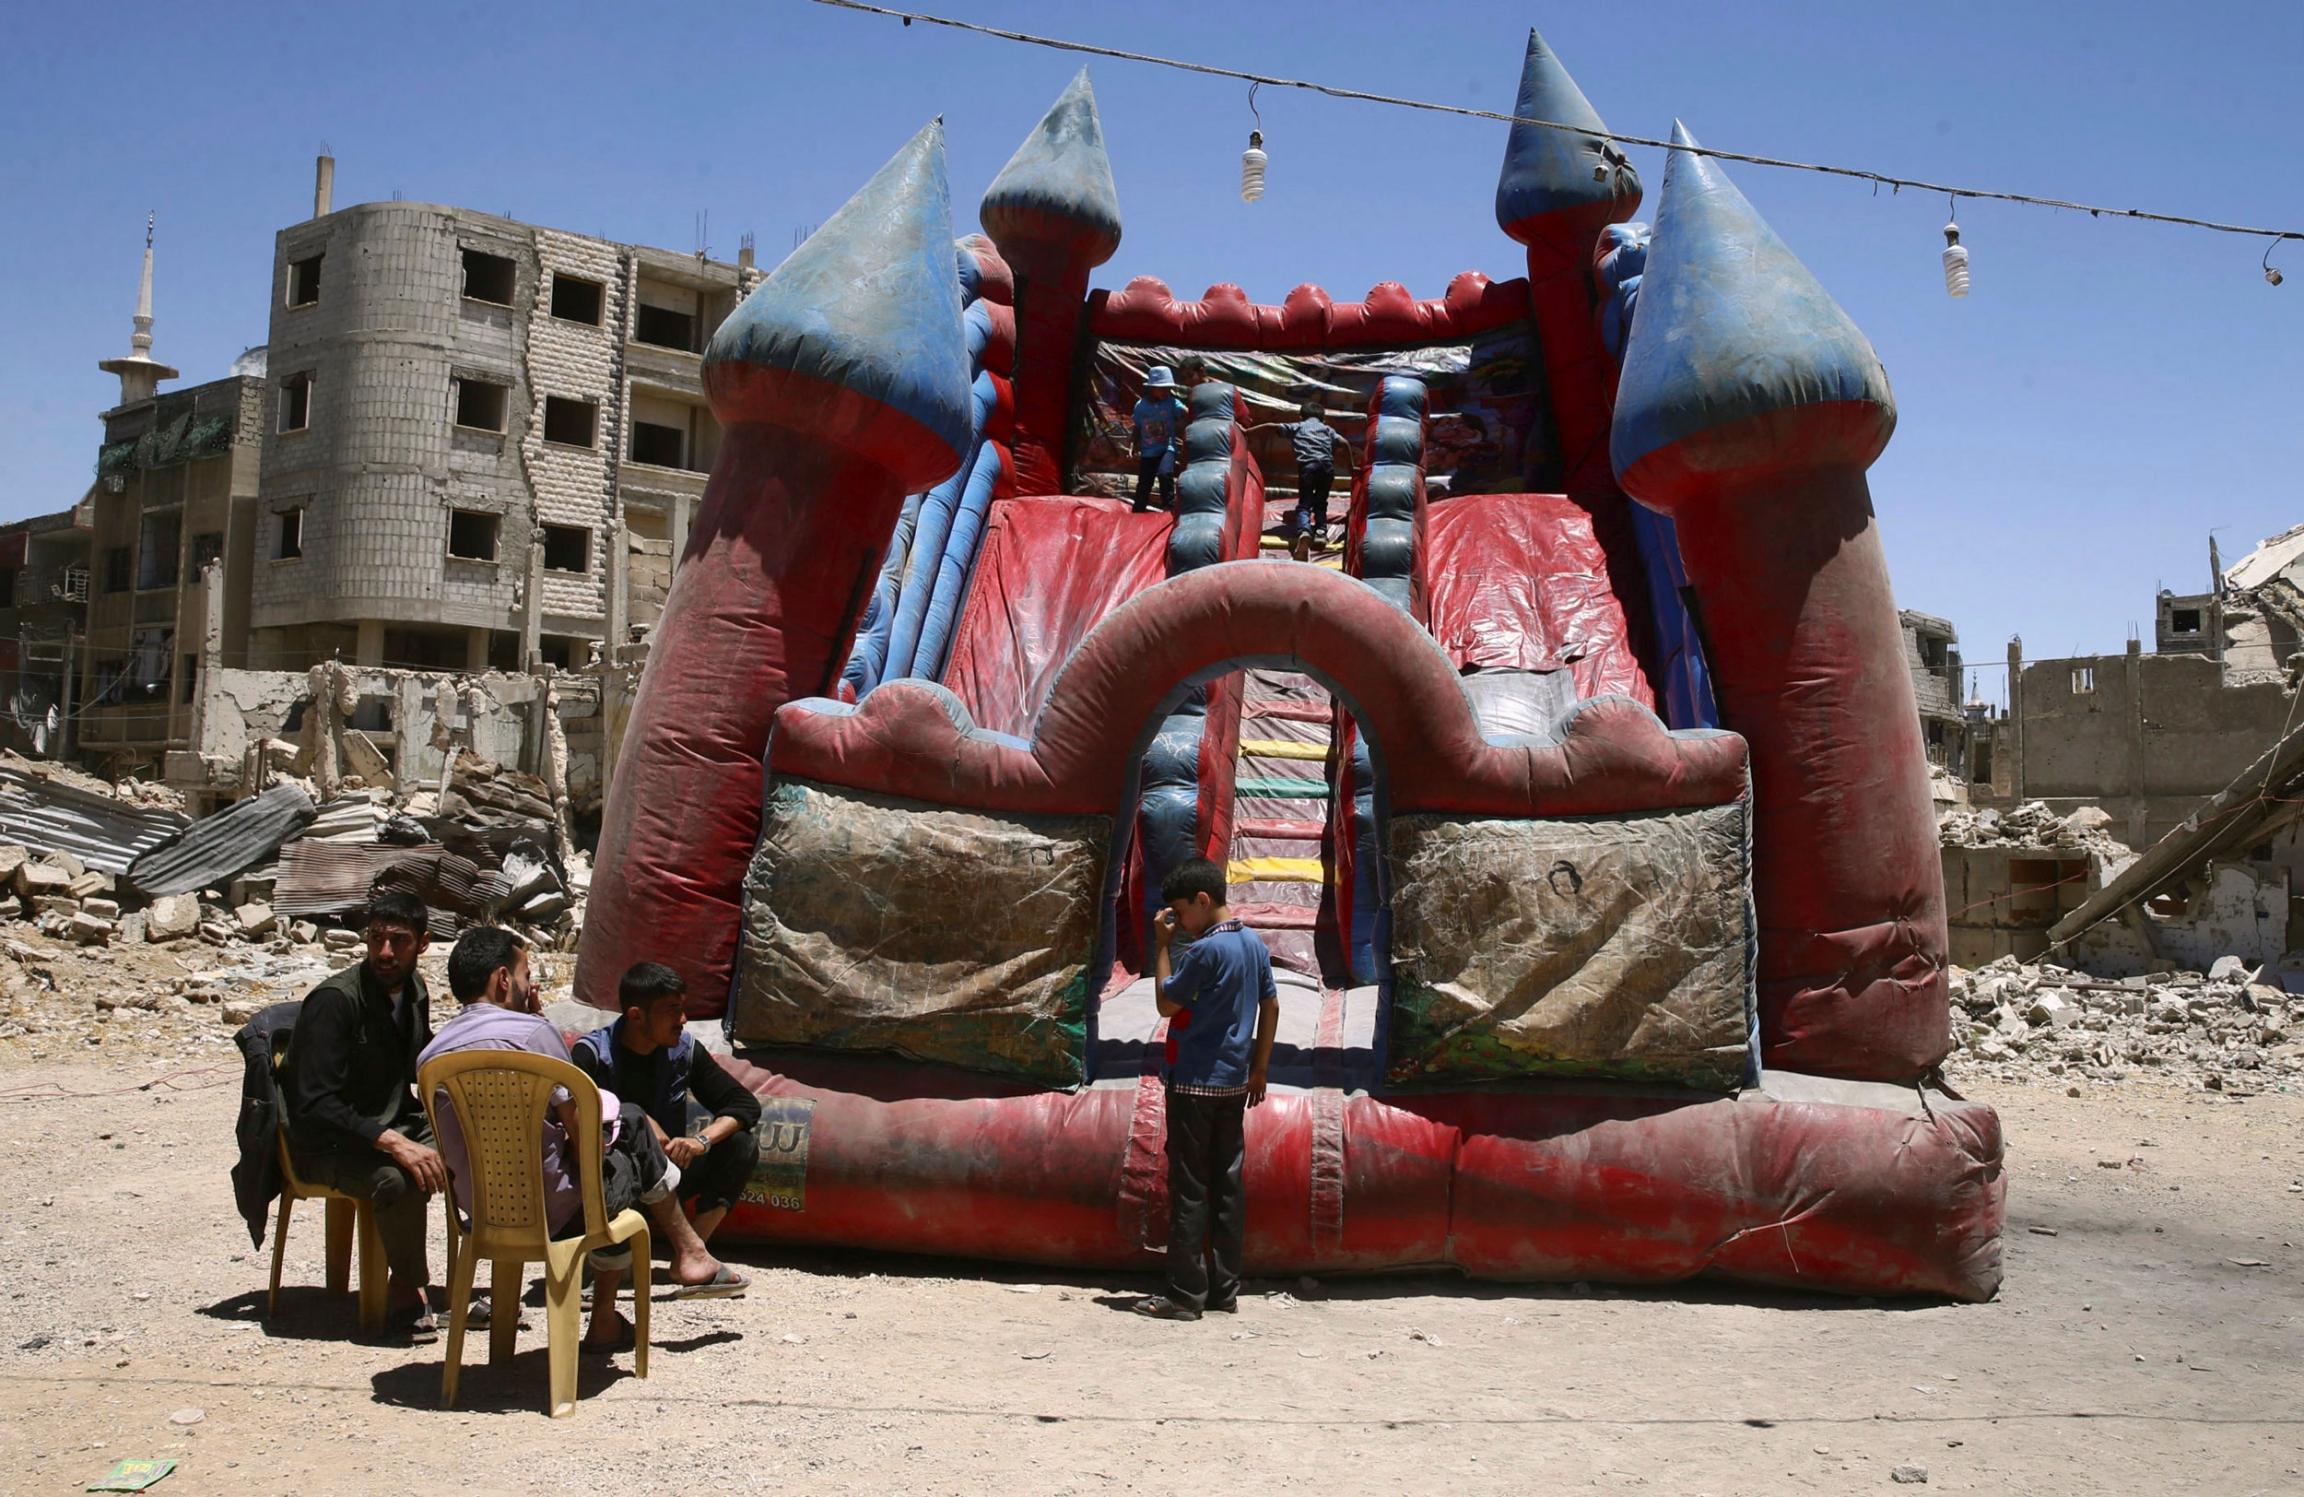 Children play inside an inflatable castle during Eid al-Fitr celebration in the Douma neighborhood of Damascus, Syria, June 26, 2017.